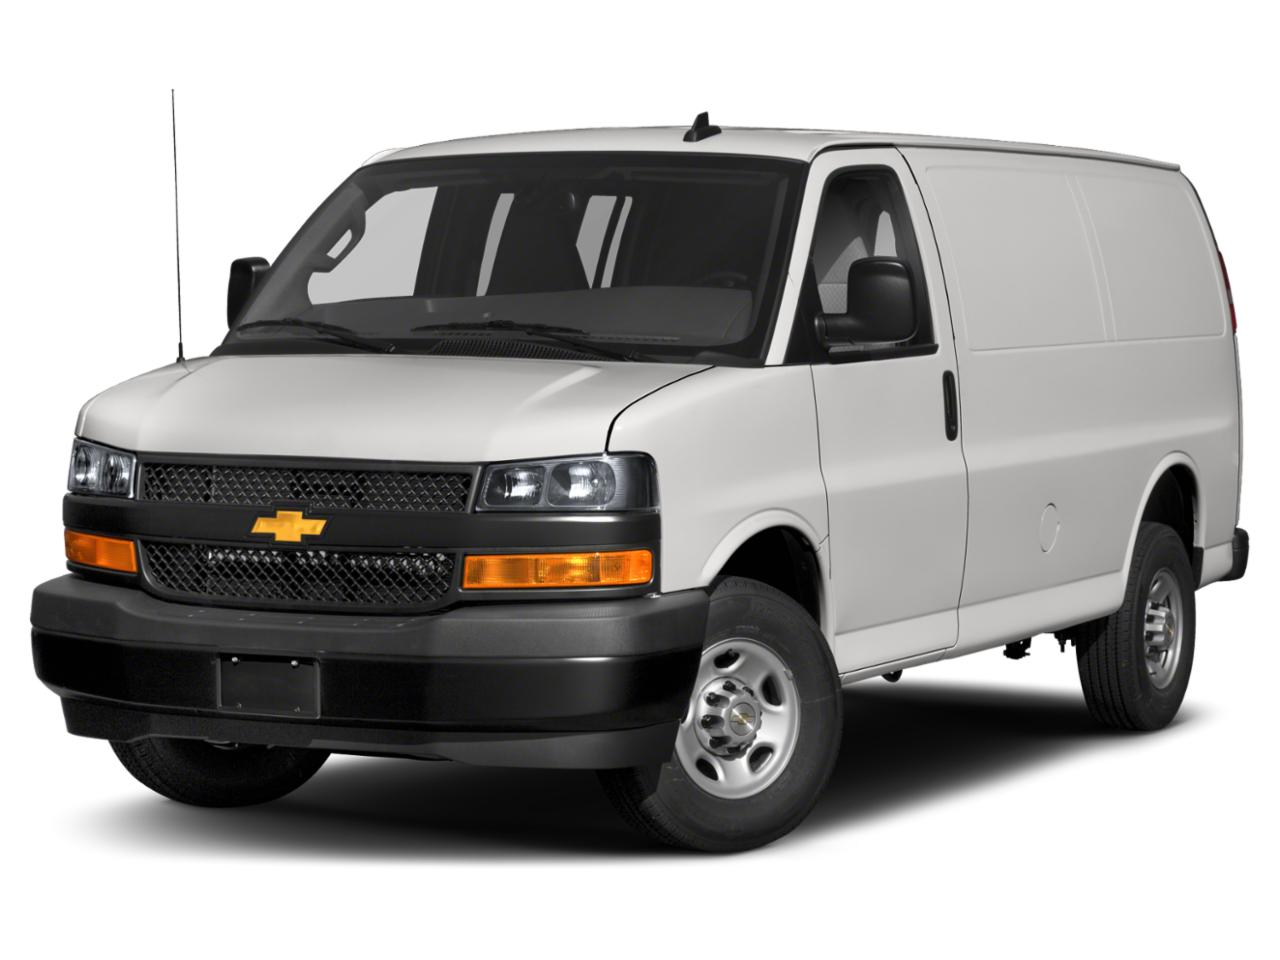 2020 Chevrolet Express Cargo Van Vehicle Photo in Doylestown, PA 18902